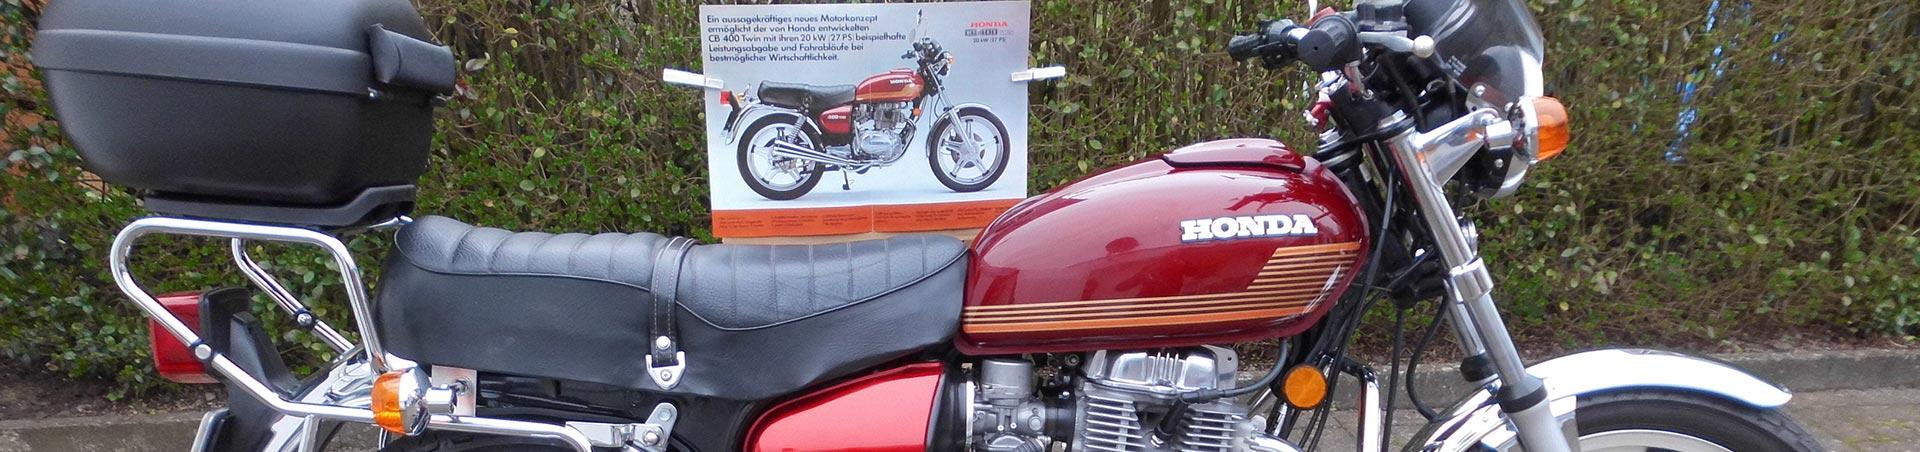 Titelbild-Honda-CB400T_31-05-2020_eb74b